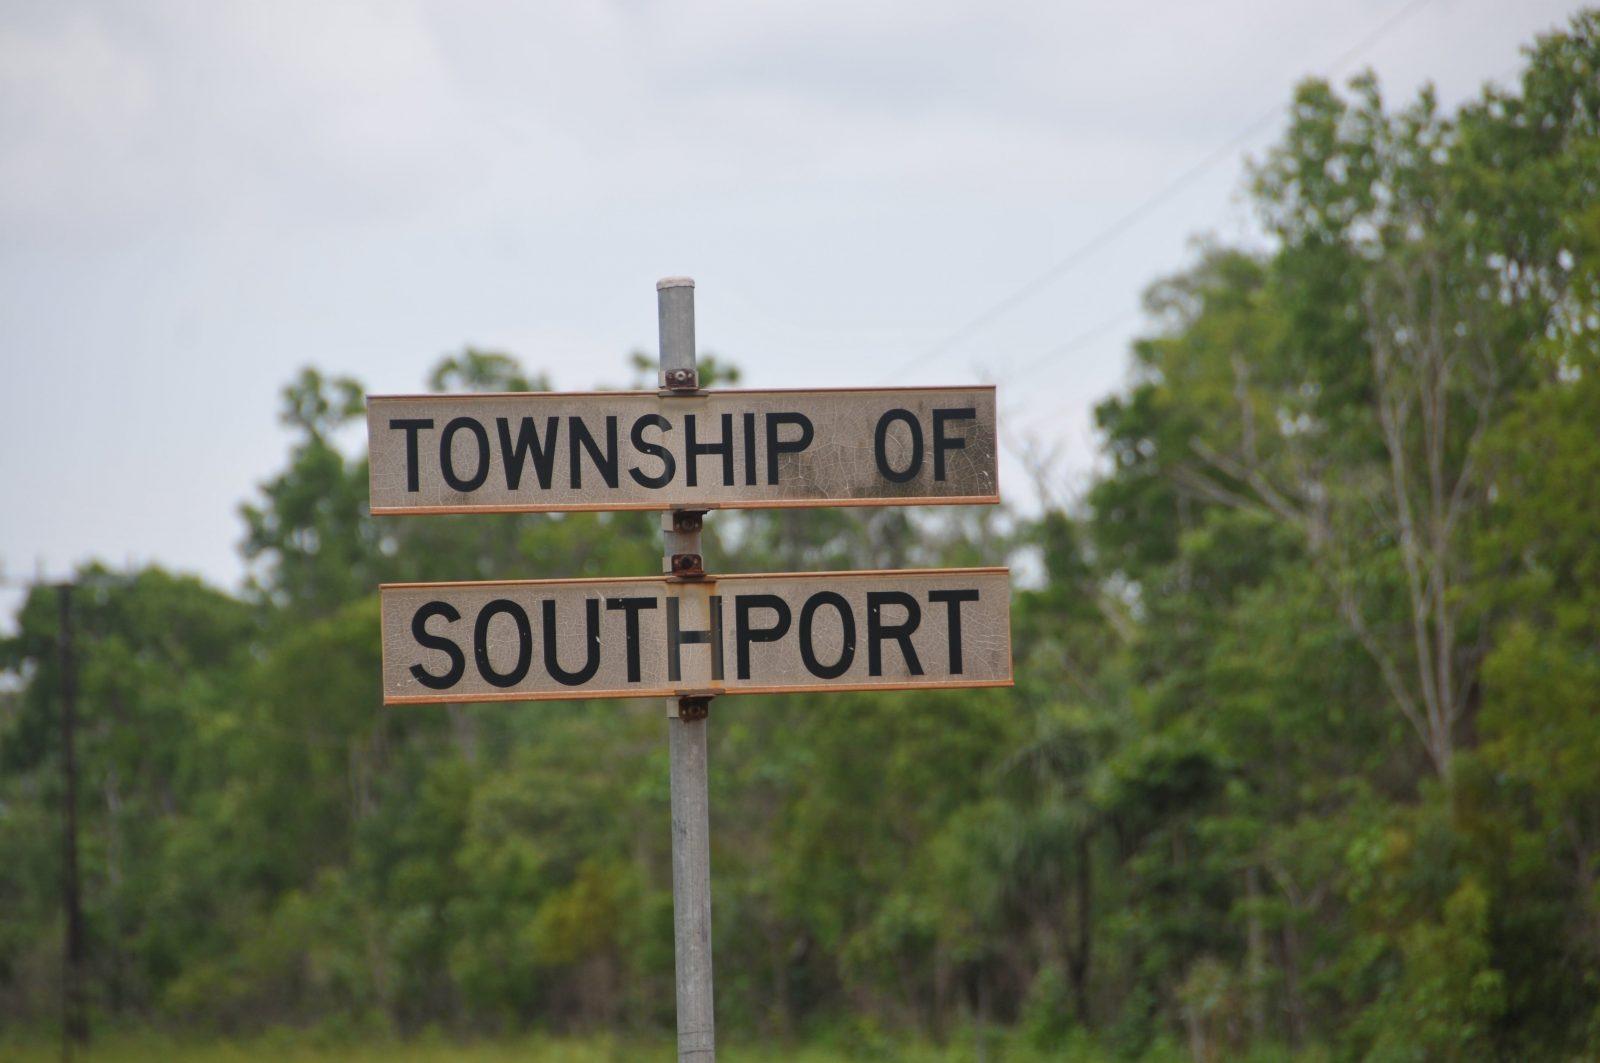 Southport Signage